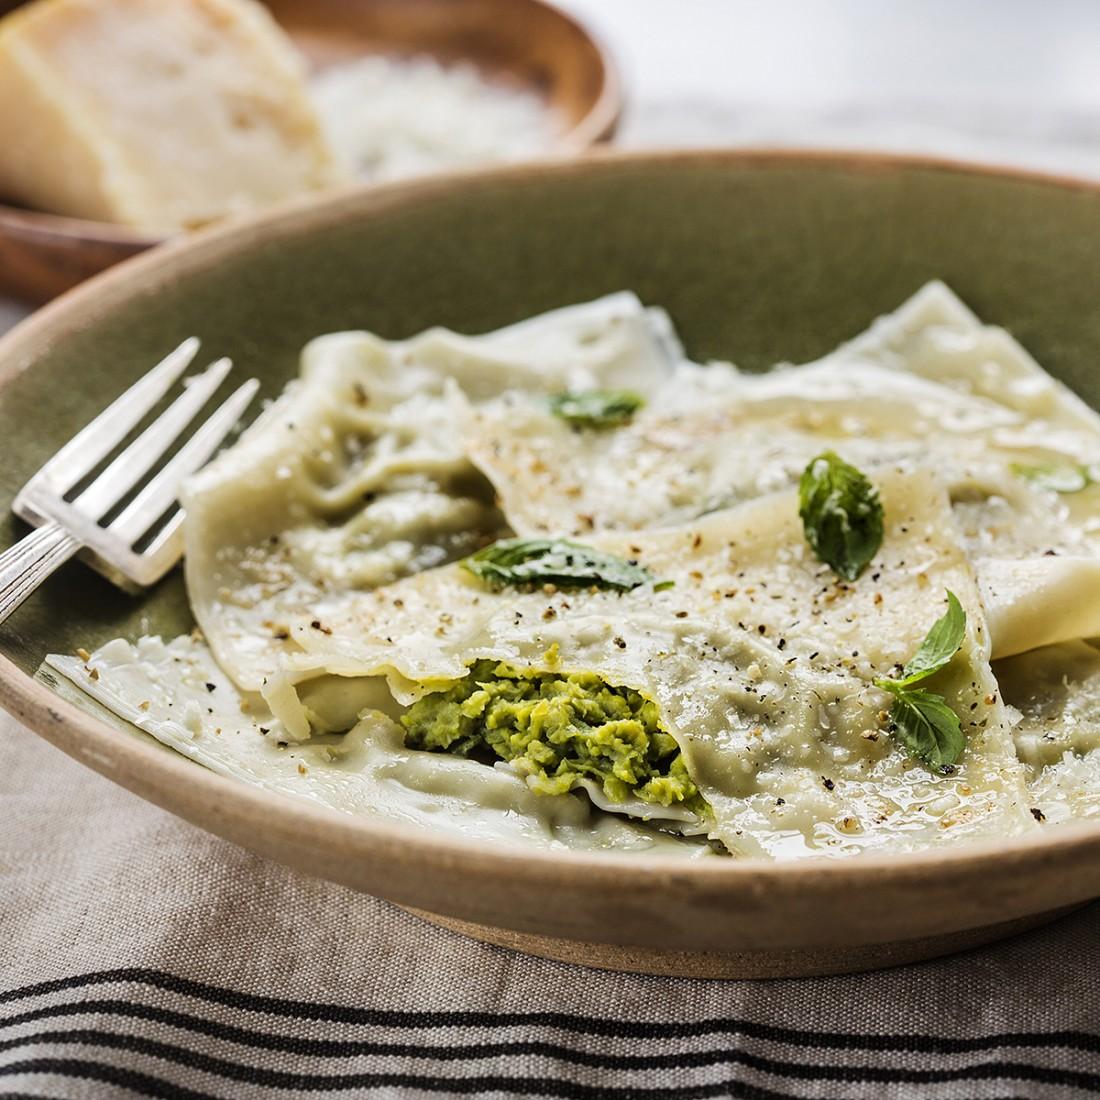 Pea & Parmesan Wonton Ravioli